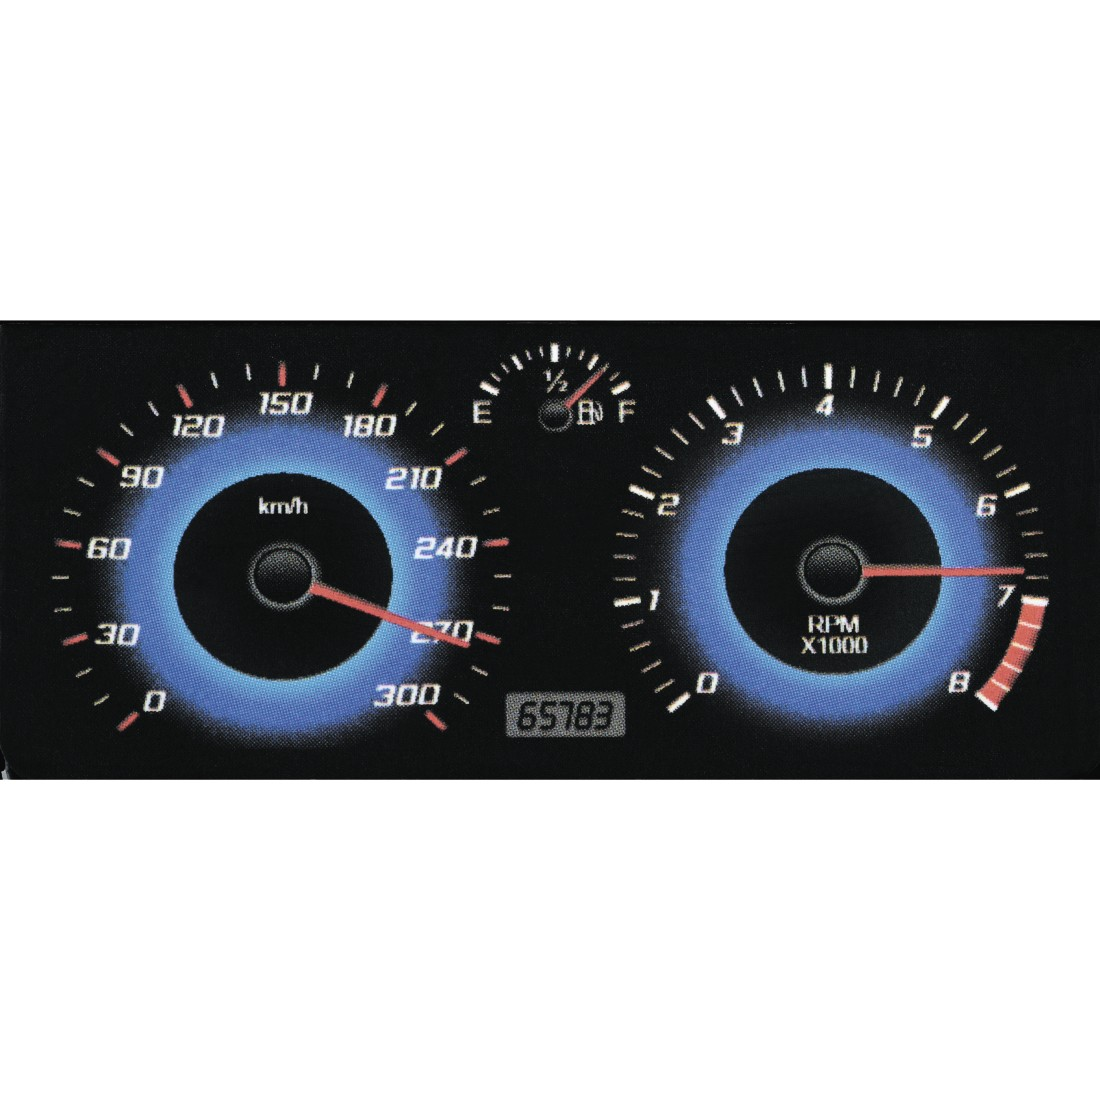 00054490 Hama 7 In 1 Racing Set Accessories Pack Ps4 Slim Pro Tachometer 4 Dex5 High Res Detail 5